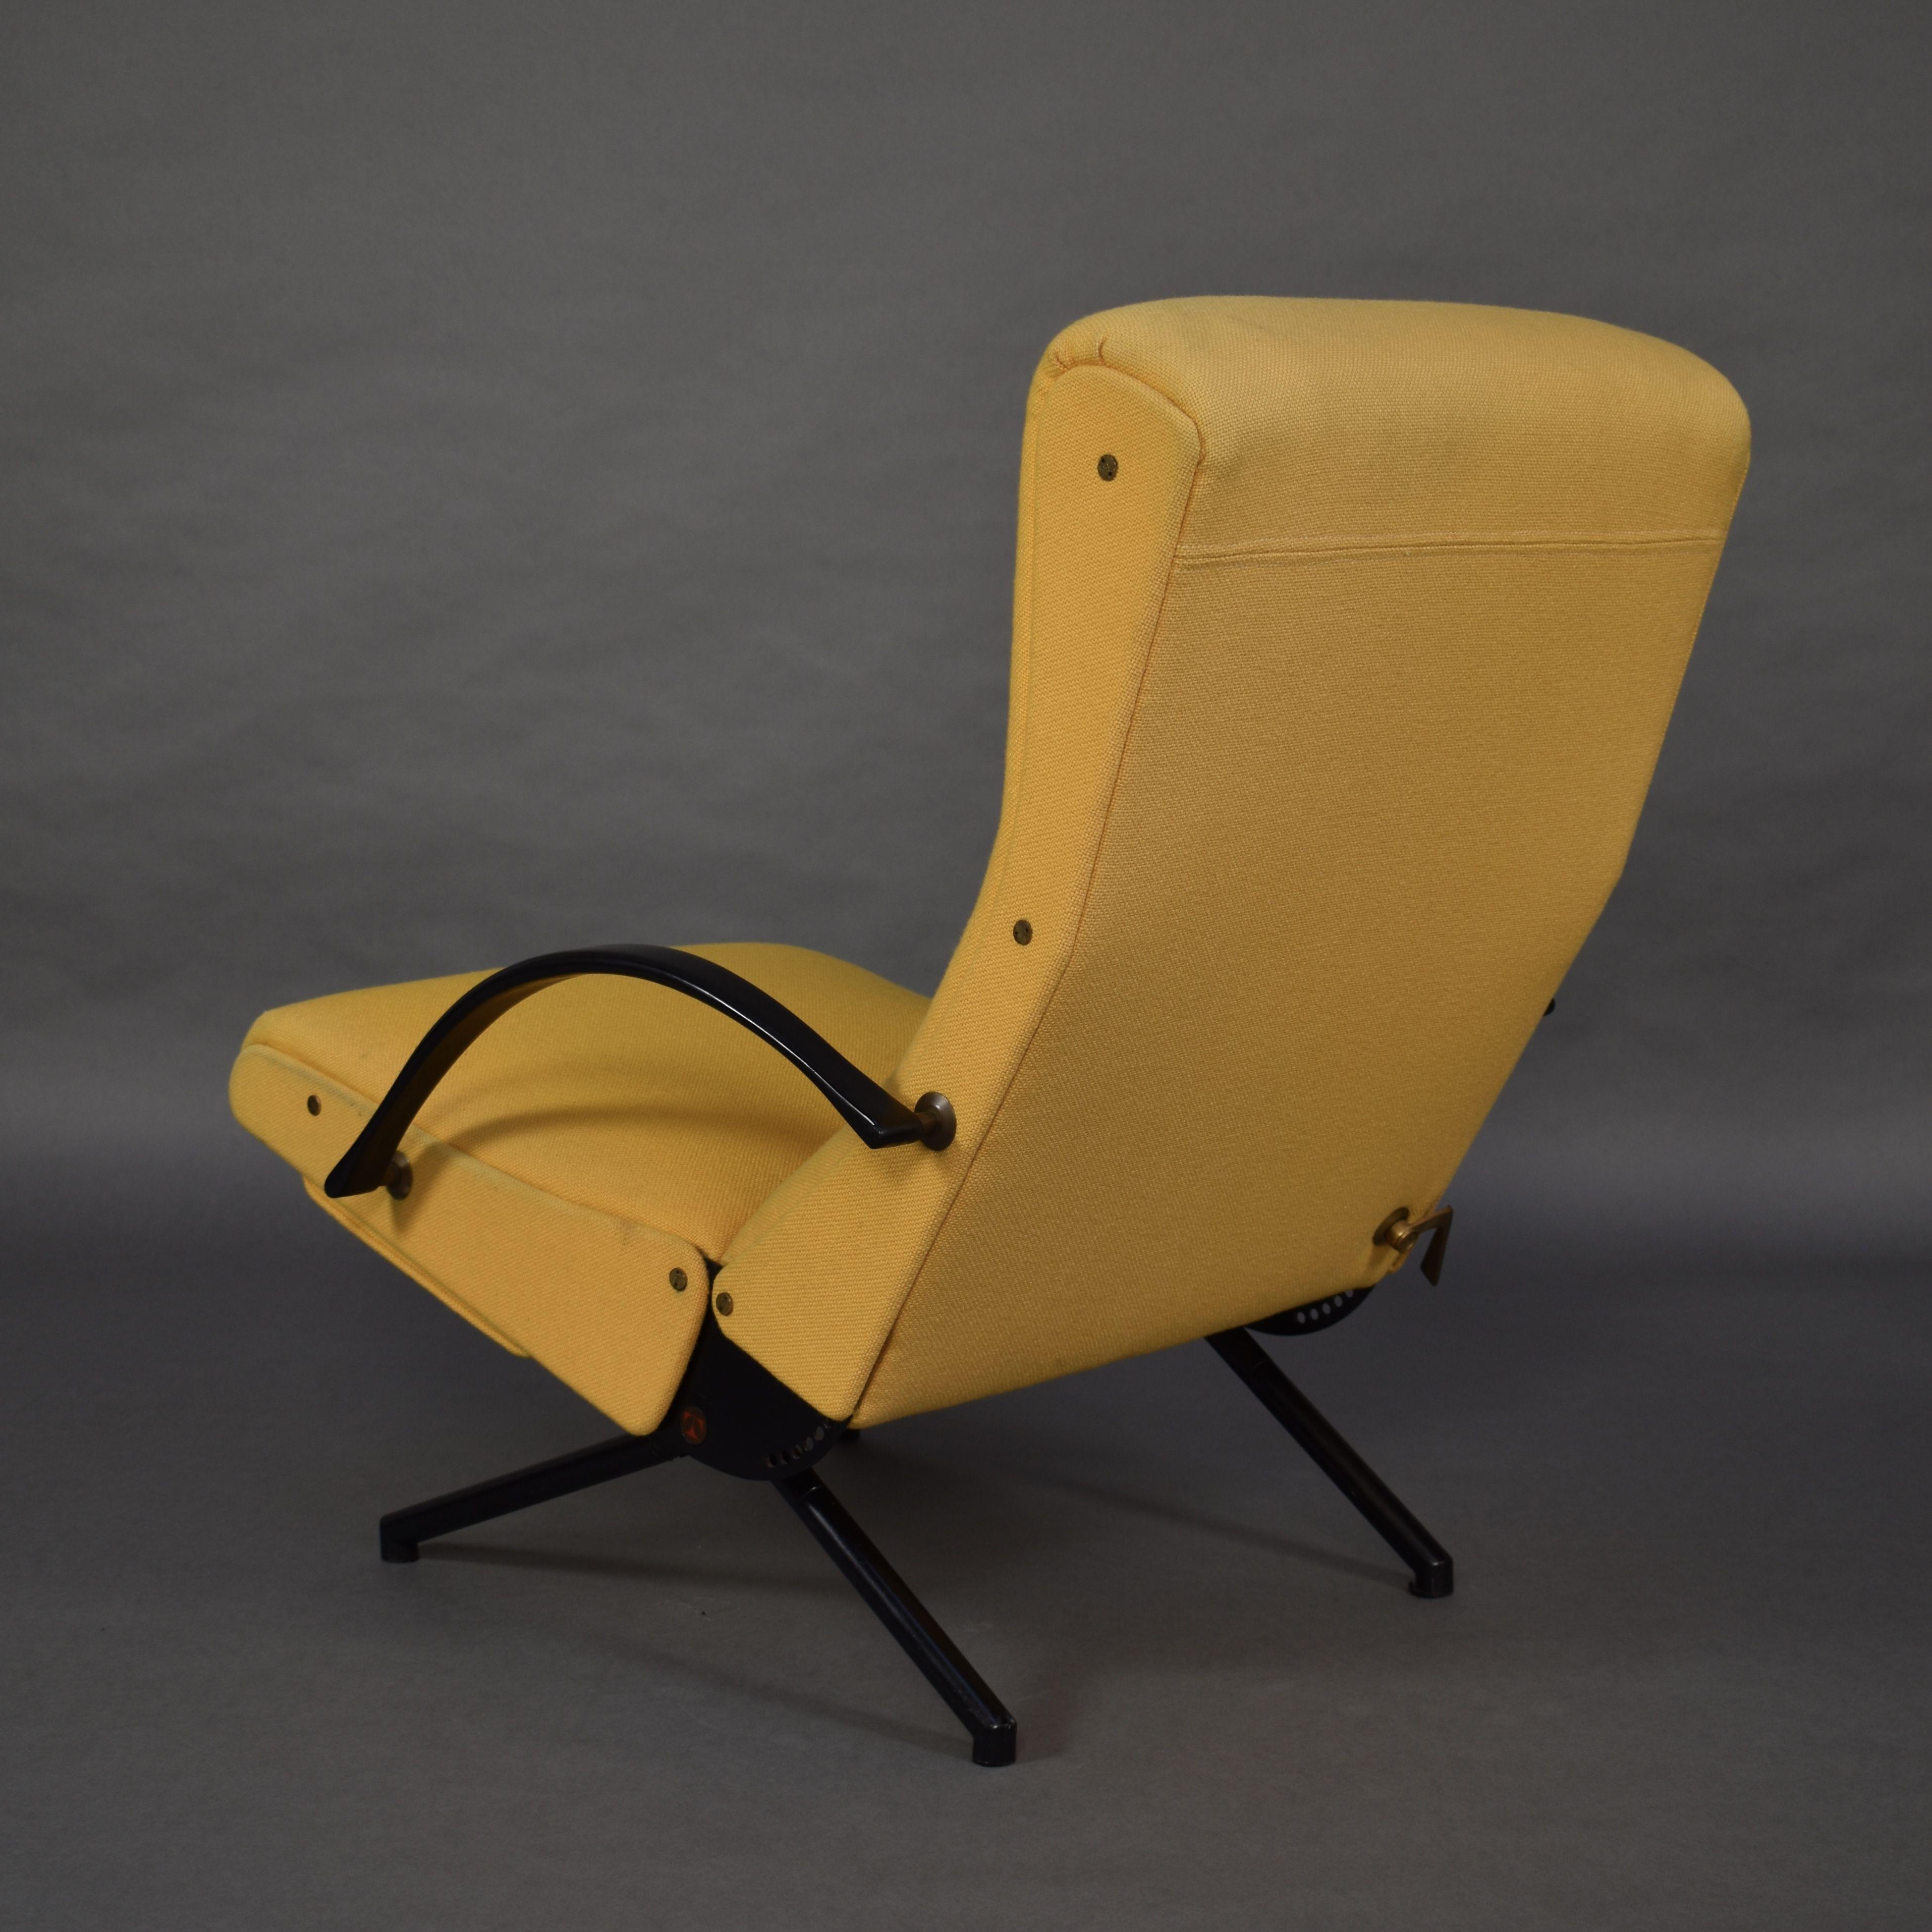 Vintage Yellow Lounge Chair P40 By Tecno Design Market